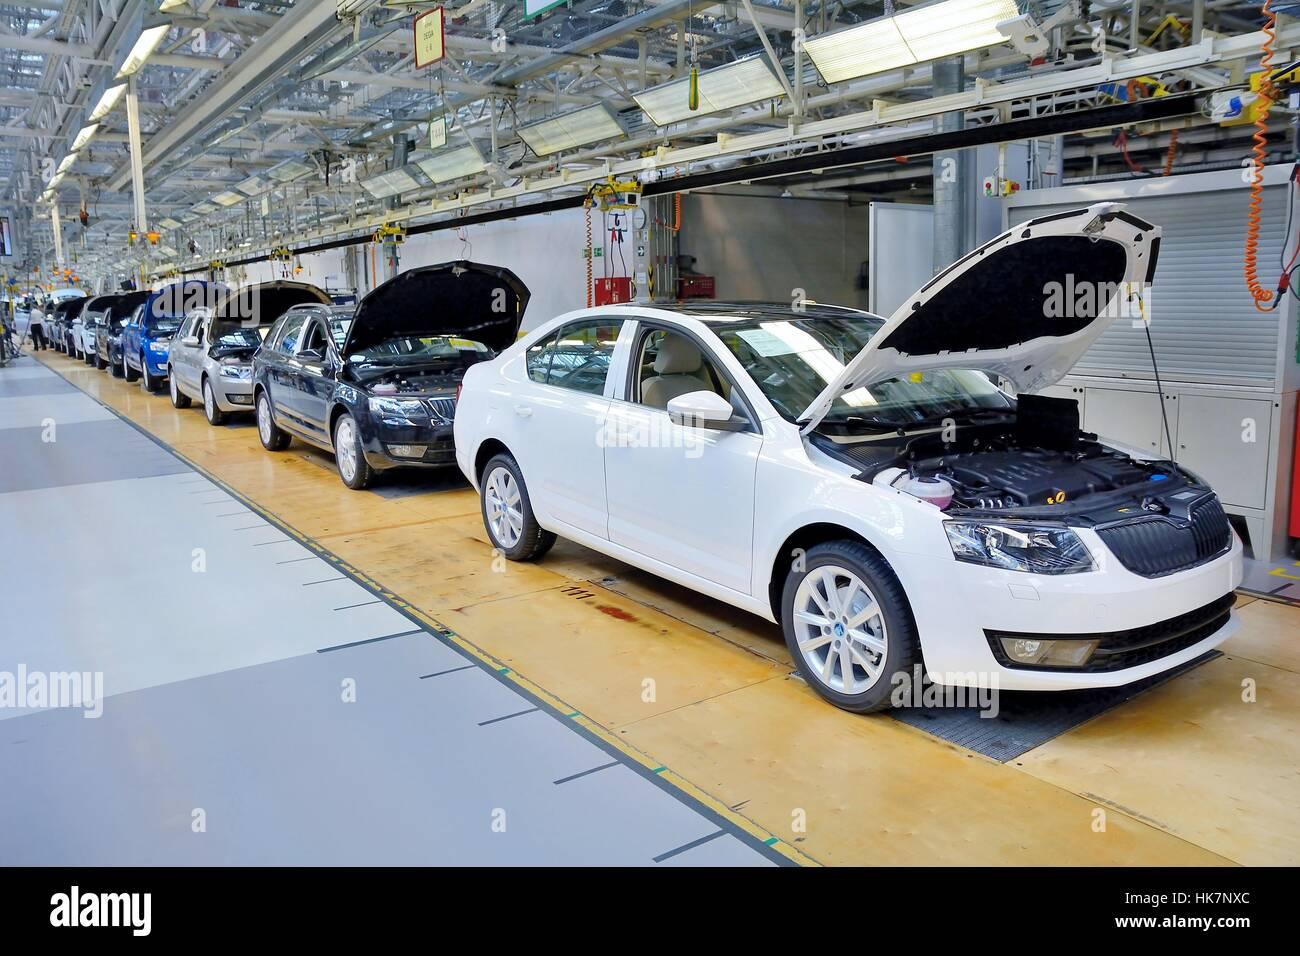 Skoda Auto car factory in Mlada Boleslav. - Stock Image